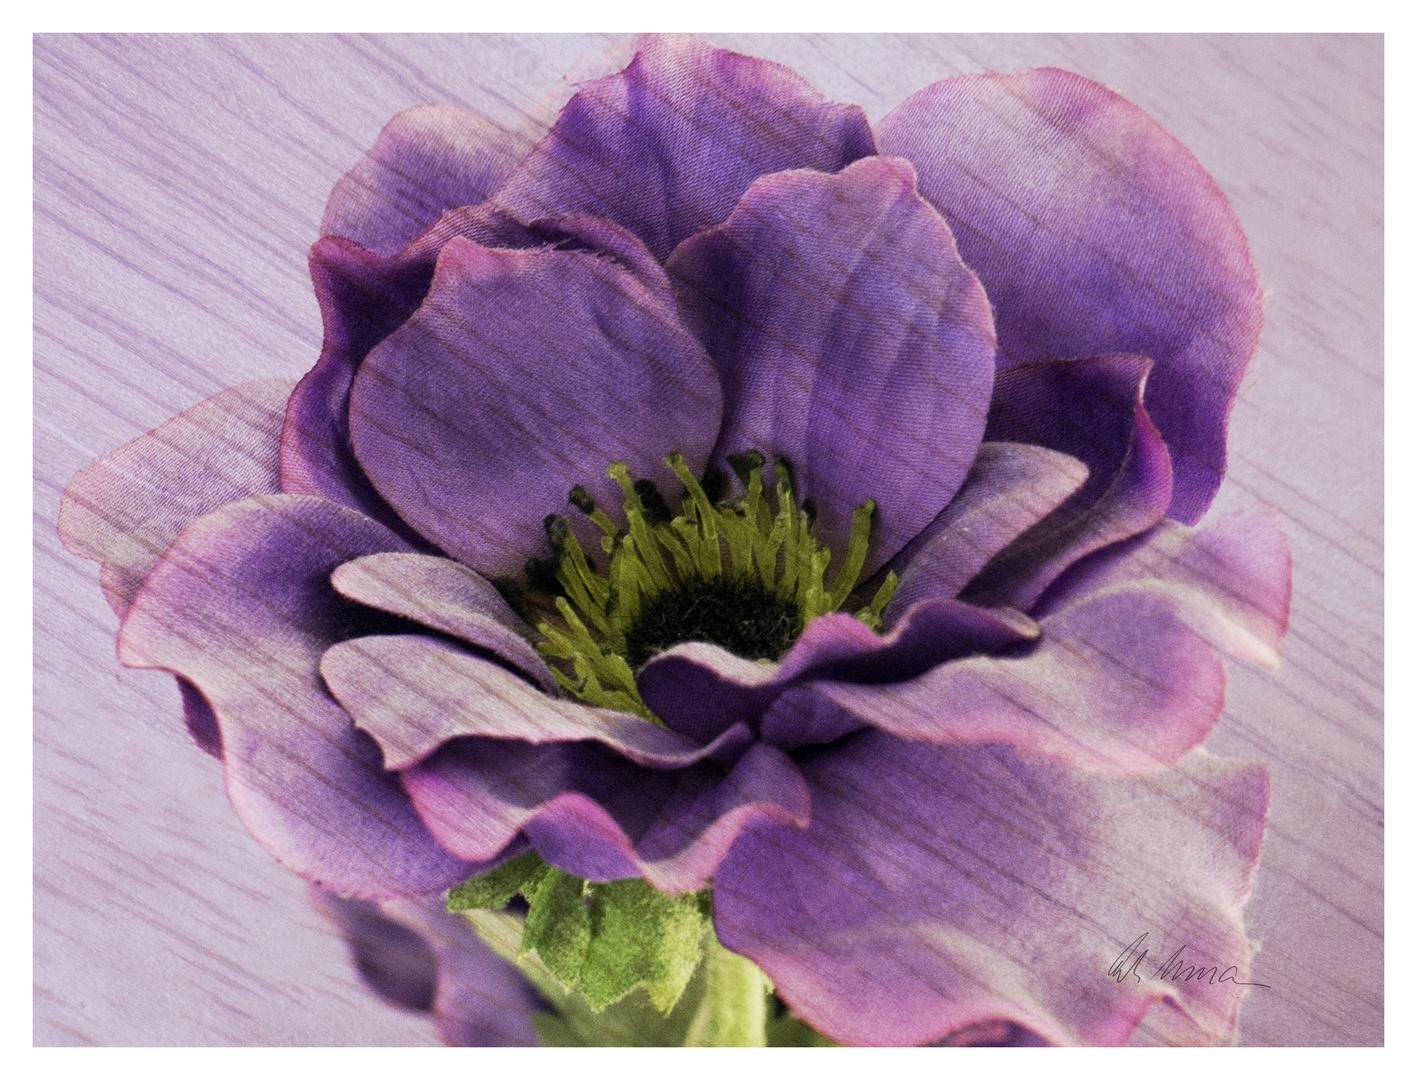 Experimentelle Trockenblumen I